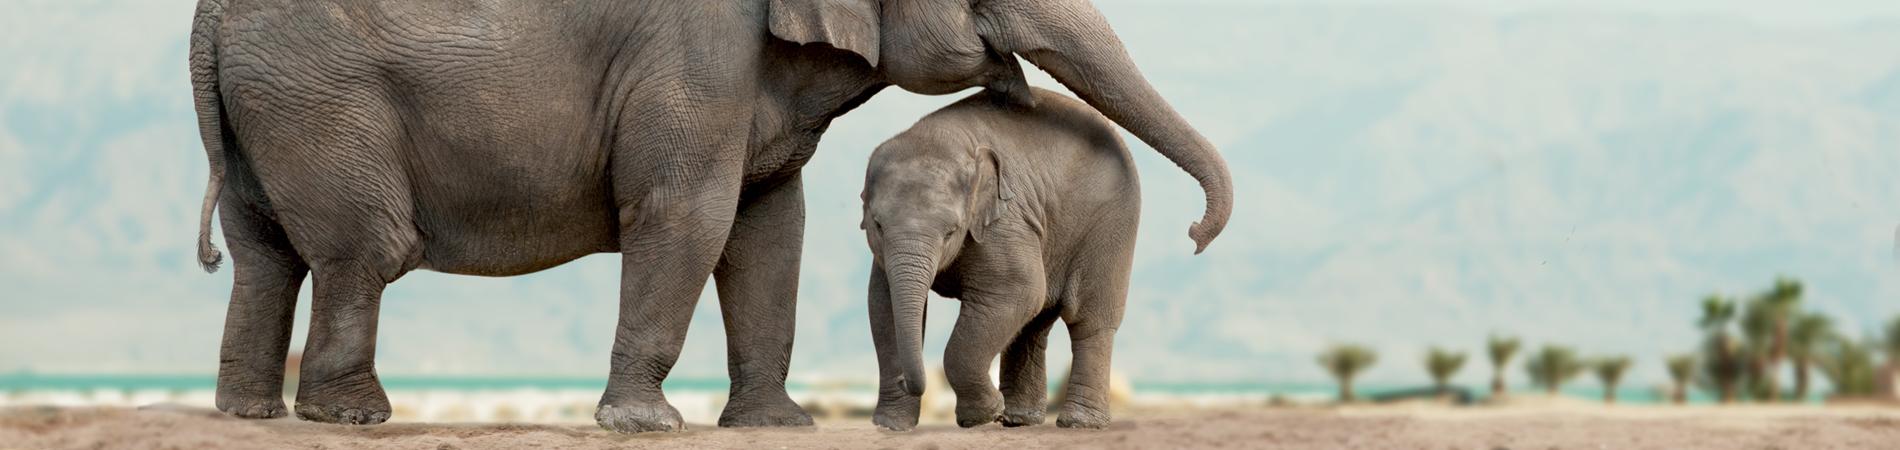 shutterstock tz header baby elephant